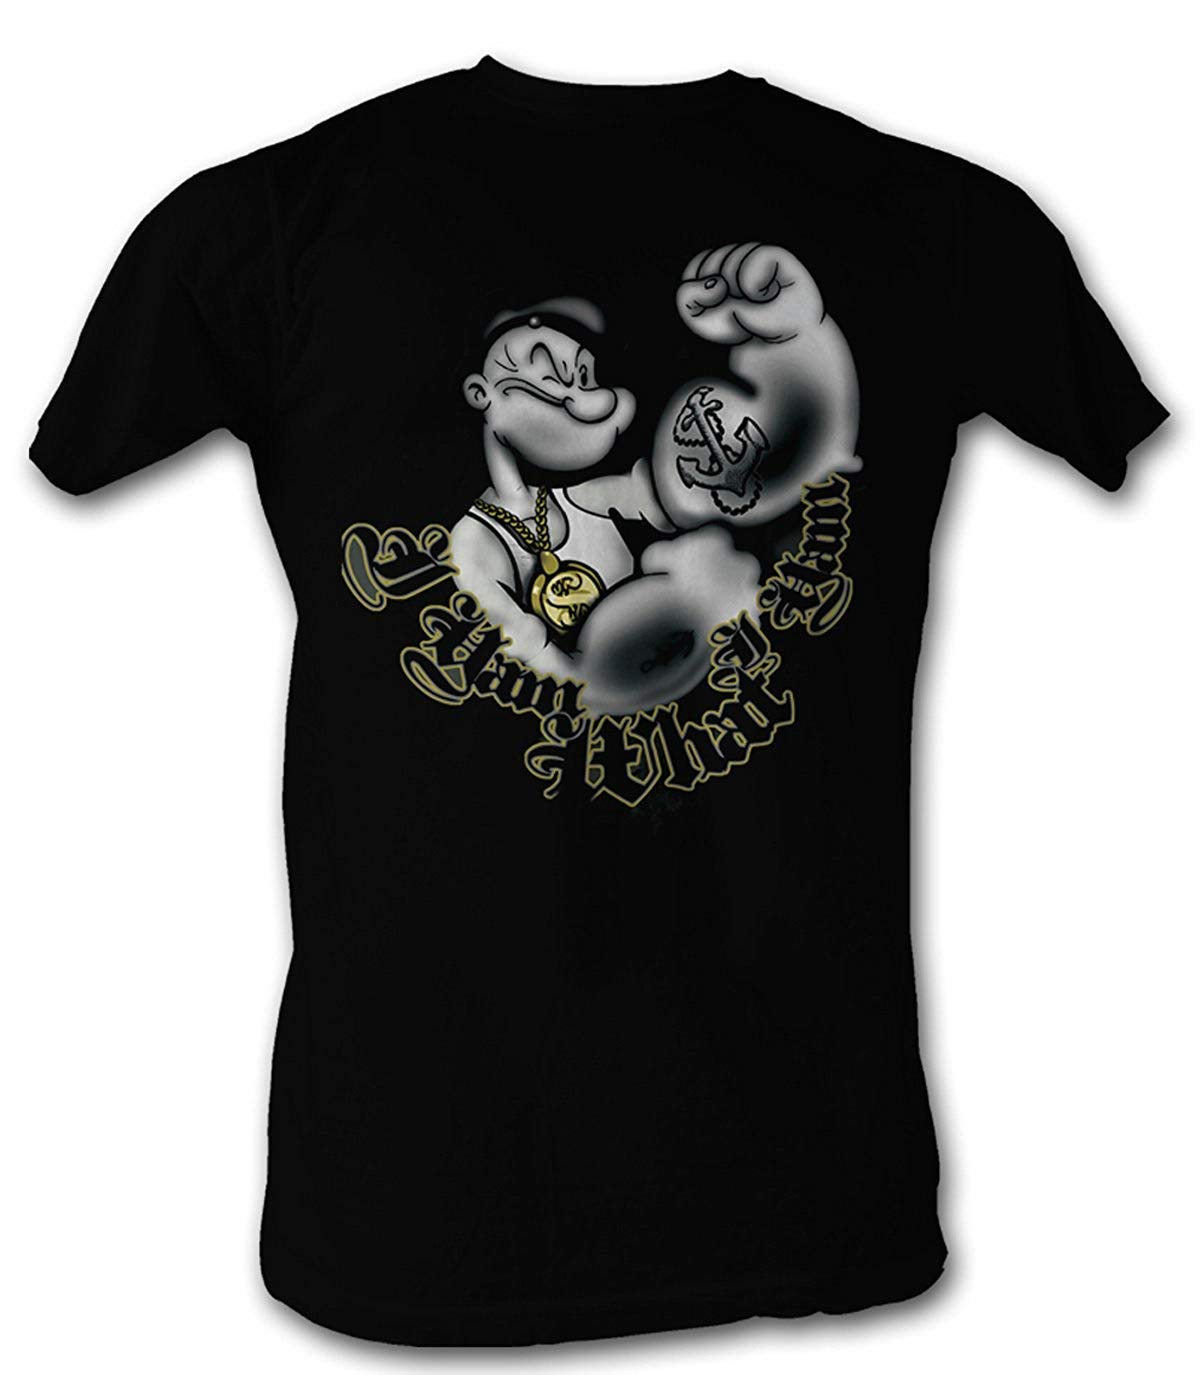 A E Designs Popeye T Shirt I Yam What I Yam Adult Black T